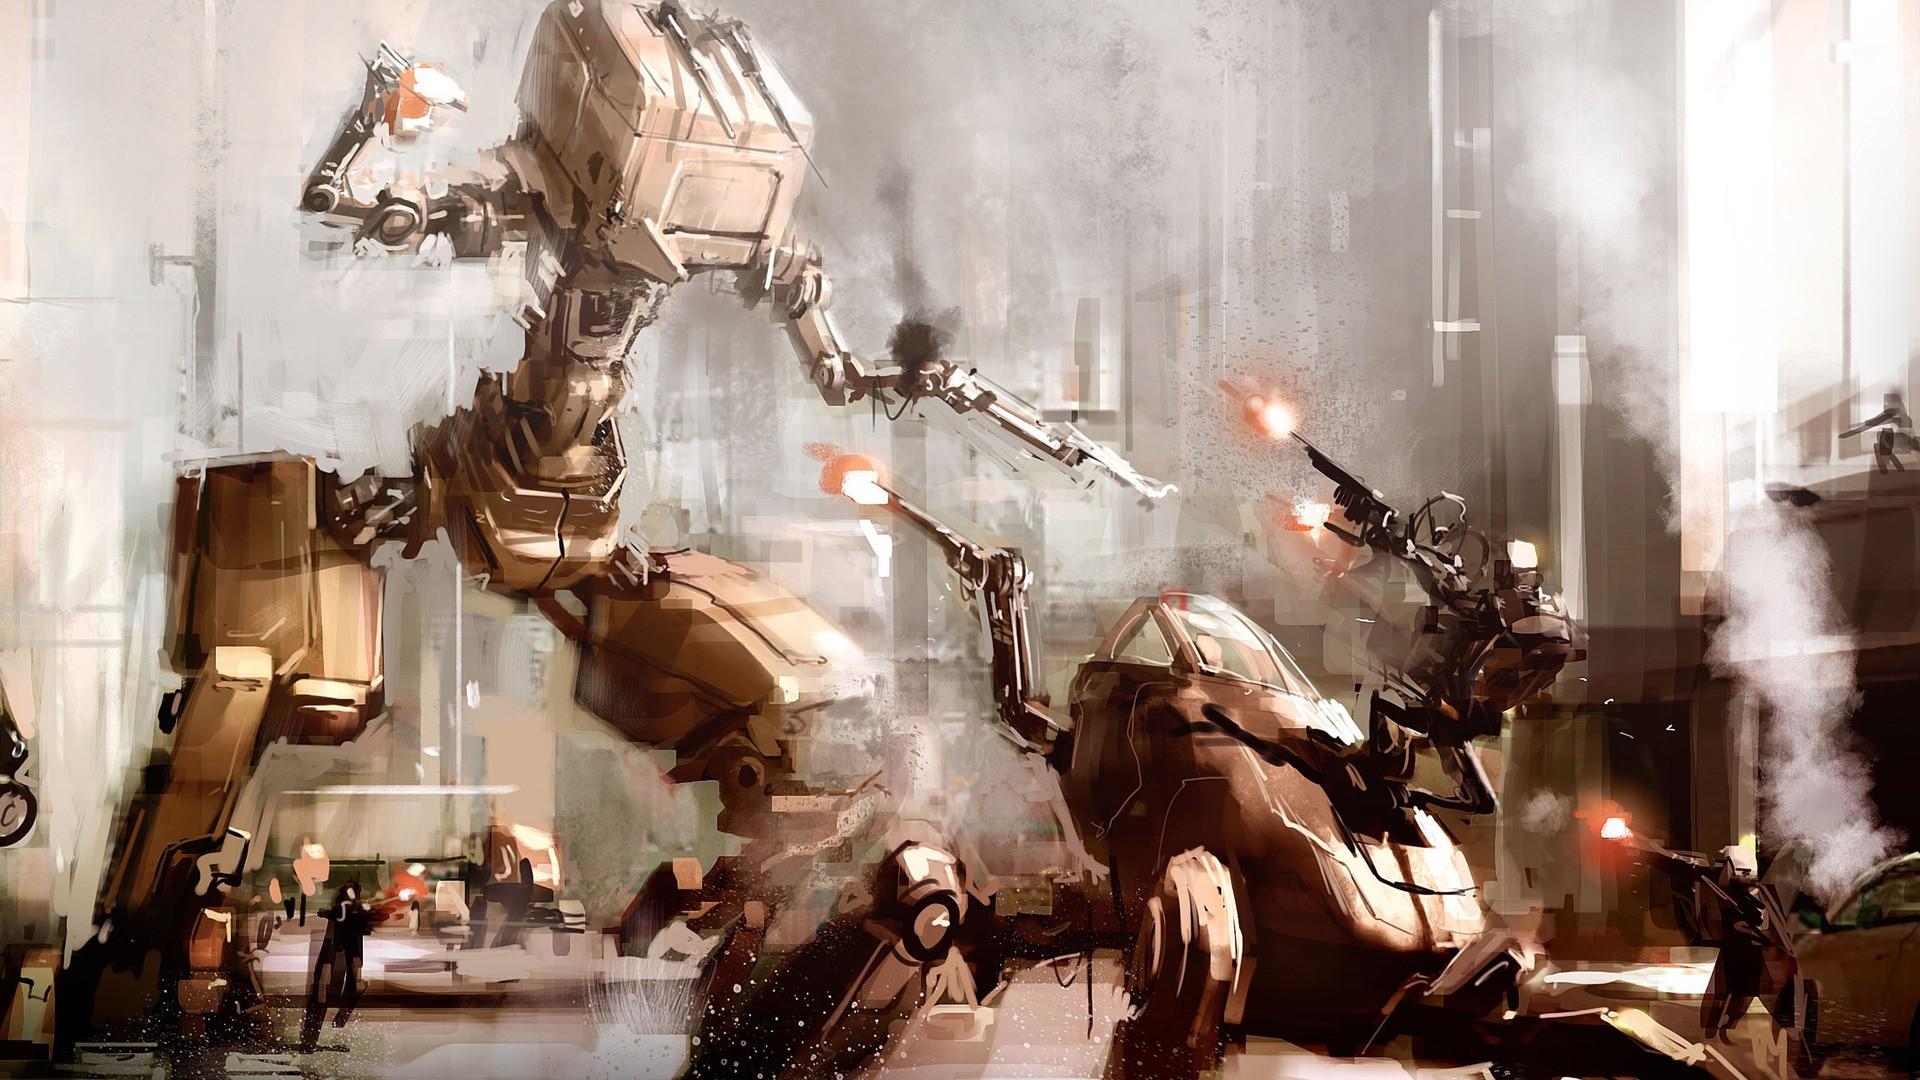 #city, #concept Art, #war, #artwork, #futuristic, #fantasy - Mech Robots Concept Art , HD Wallpaper & Backgrounds